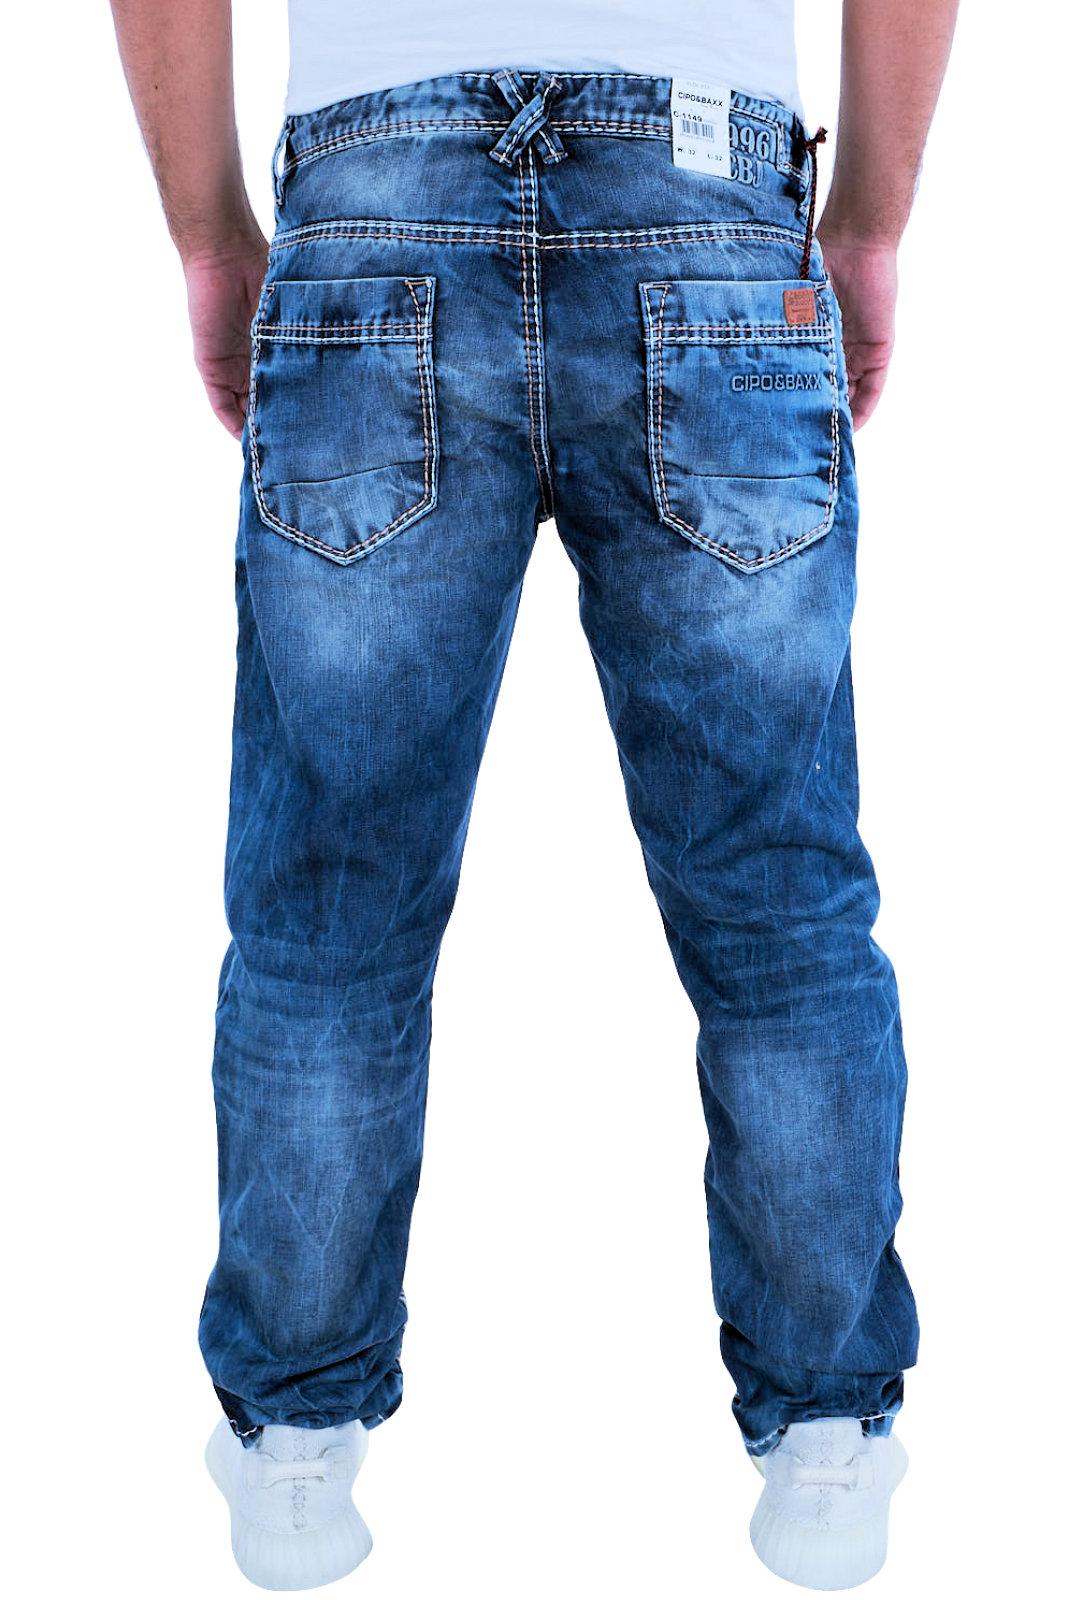 Cipo-amp-Baxx-Mens-Jeans-Clubwear-Denim-Trousers-c-1149-Straight-Thick-Seam-New-C-11 thumbnail 3